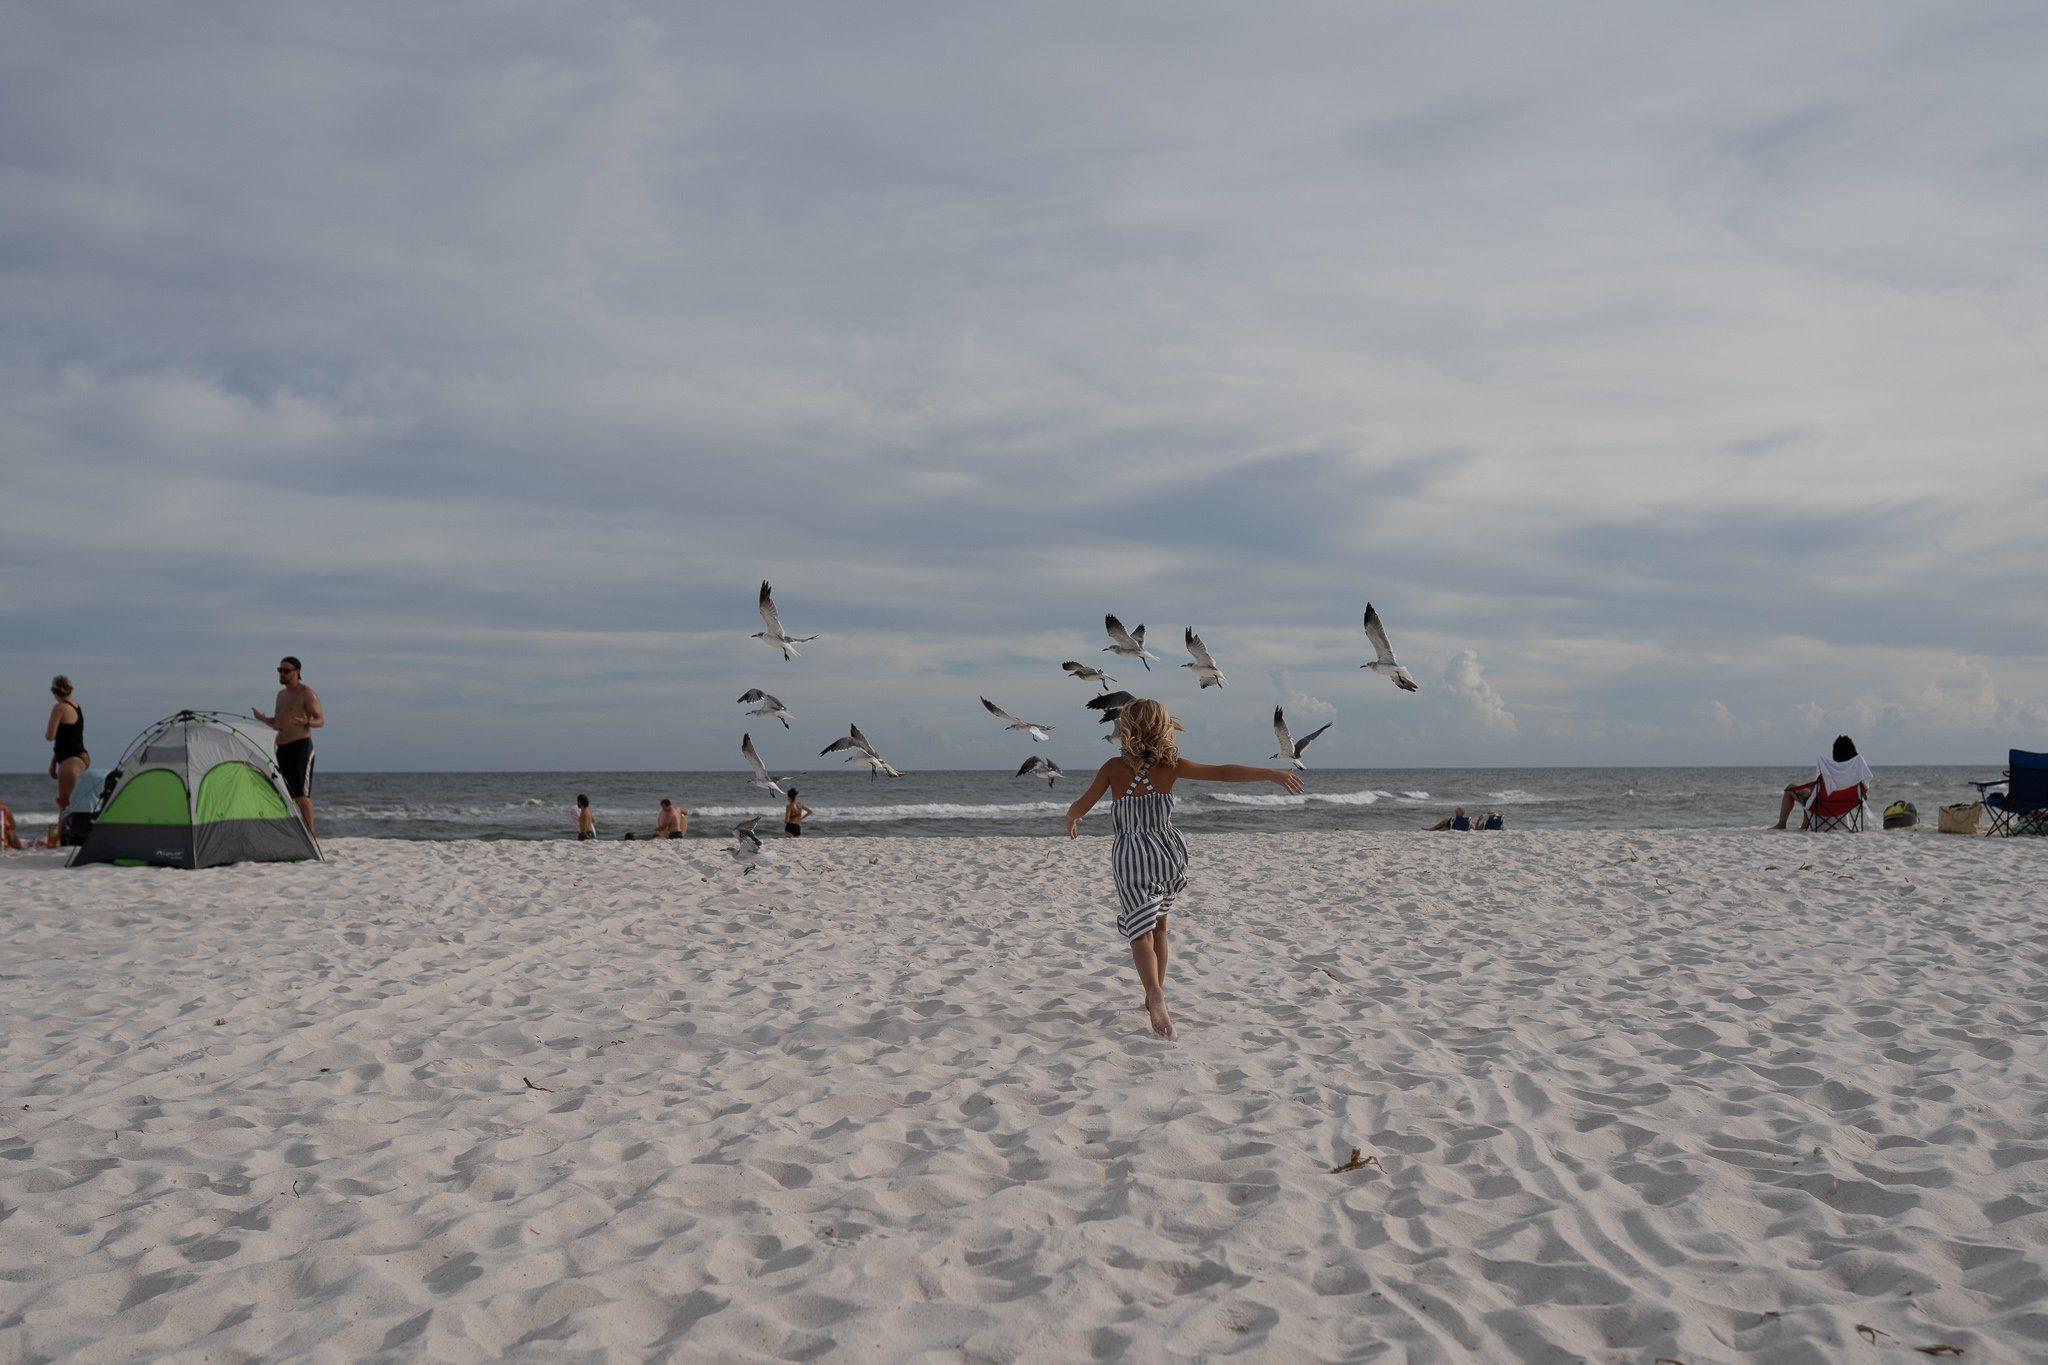 beach portraits edited